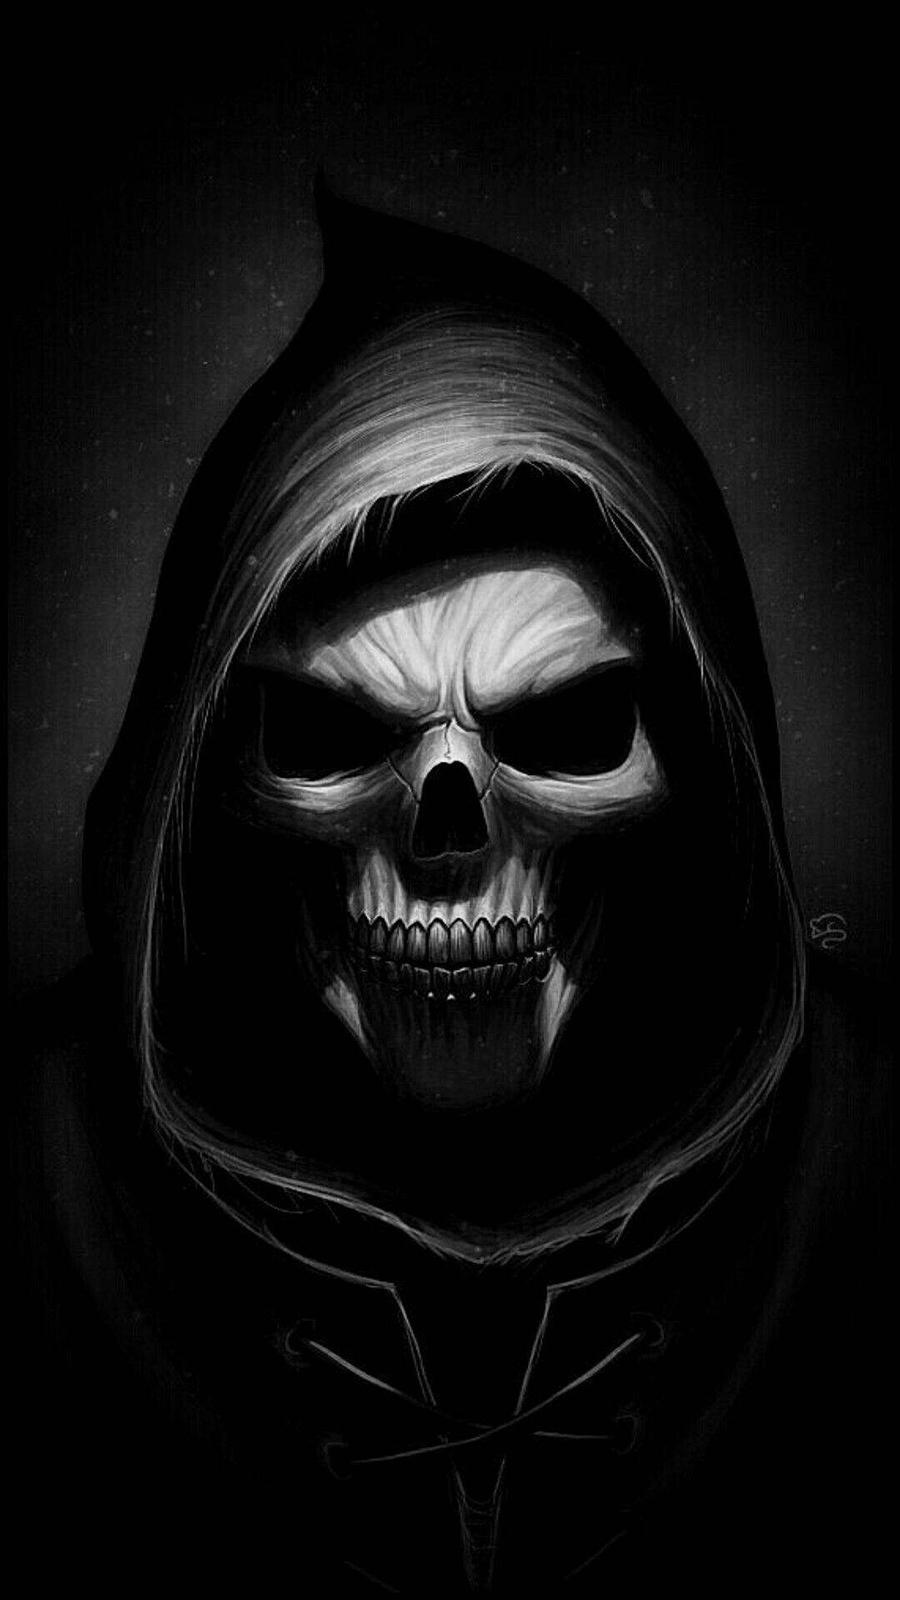 Skull Man Full HD Wallpapers Now Download